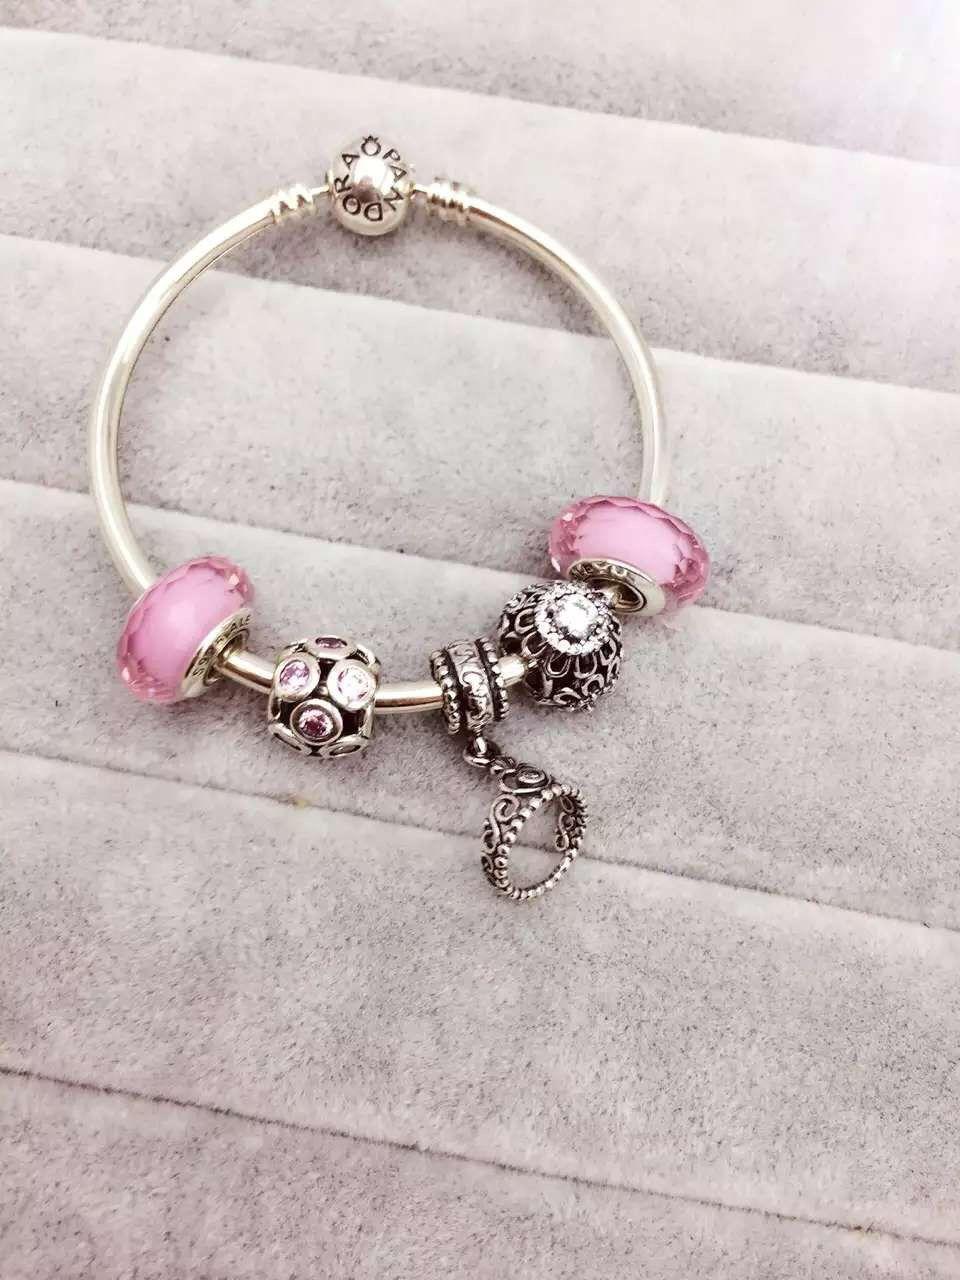 893a63a5a0d63 50% OFF!!! $159 Pandora Bangle Charm Bracelet Pink. Hot Sale!!! SKU ...